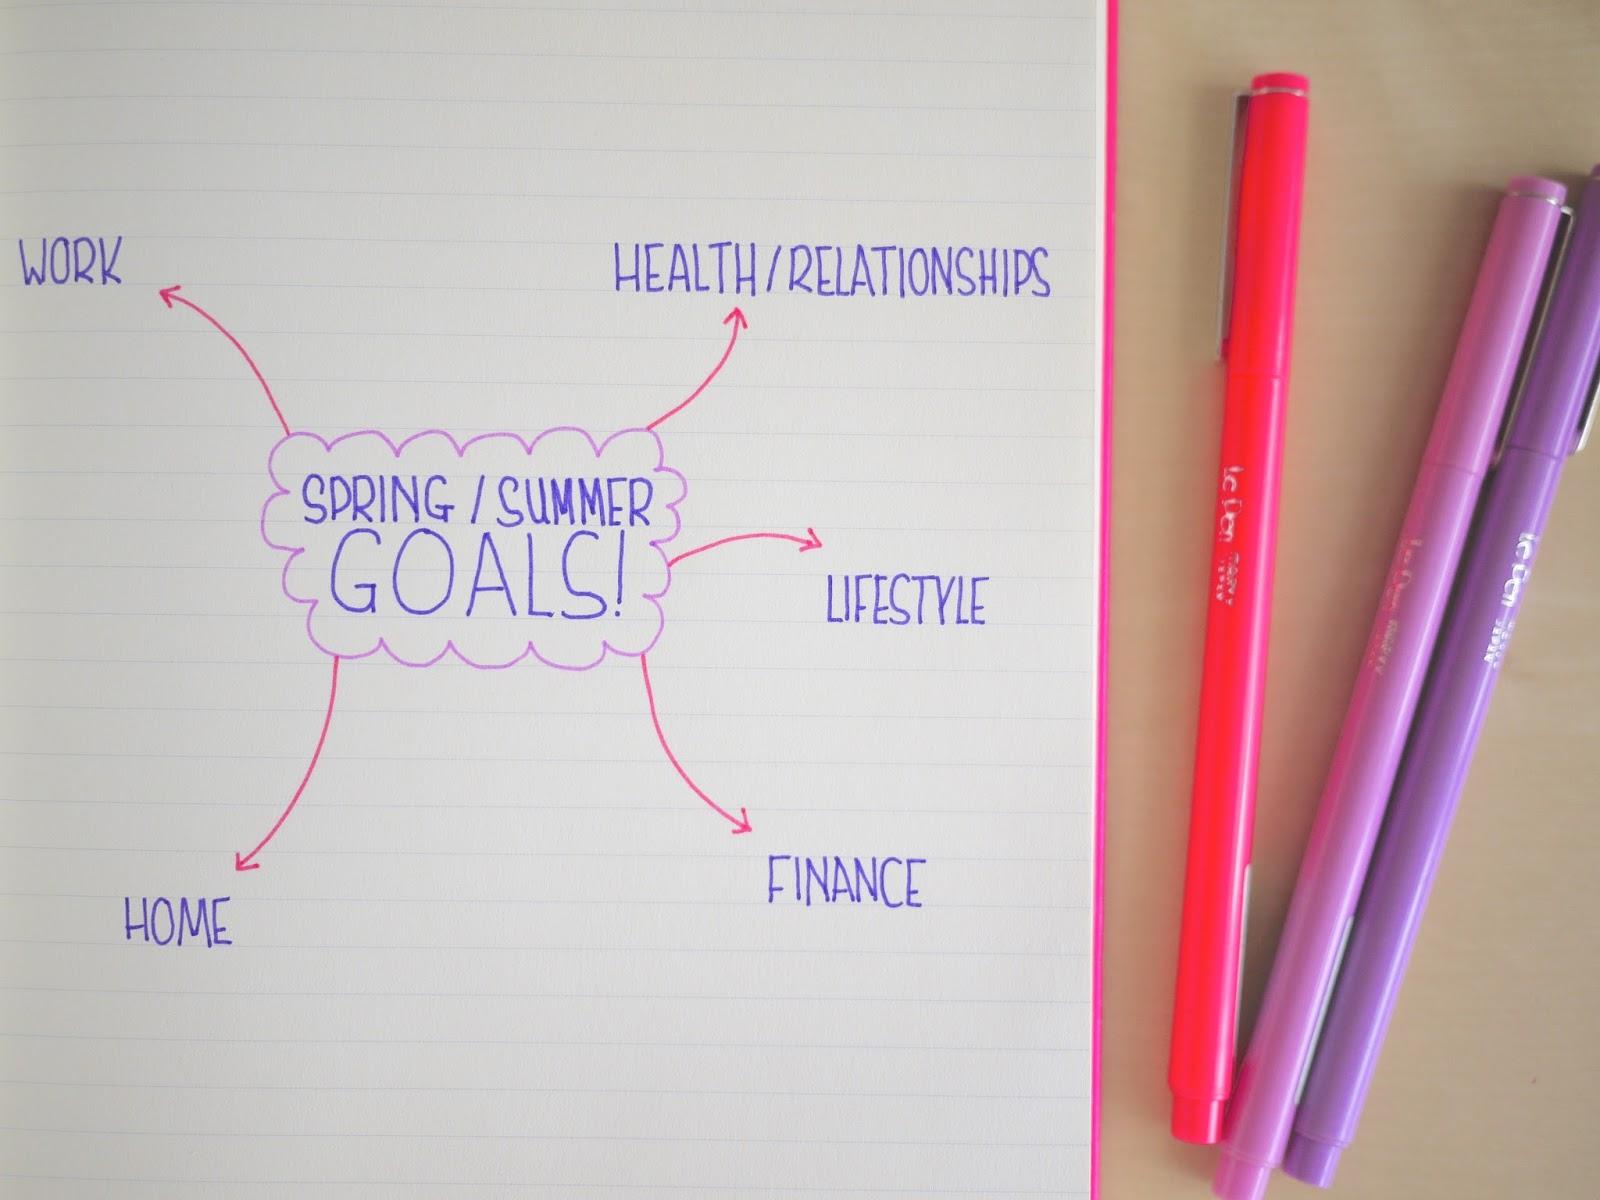 Spring/ summer goals